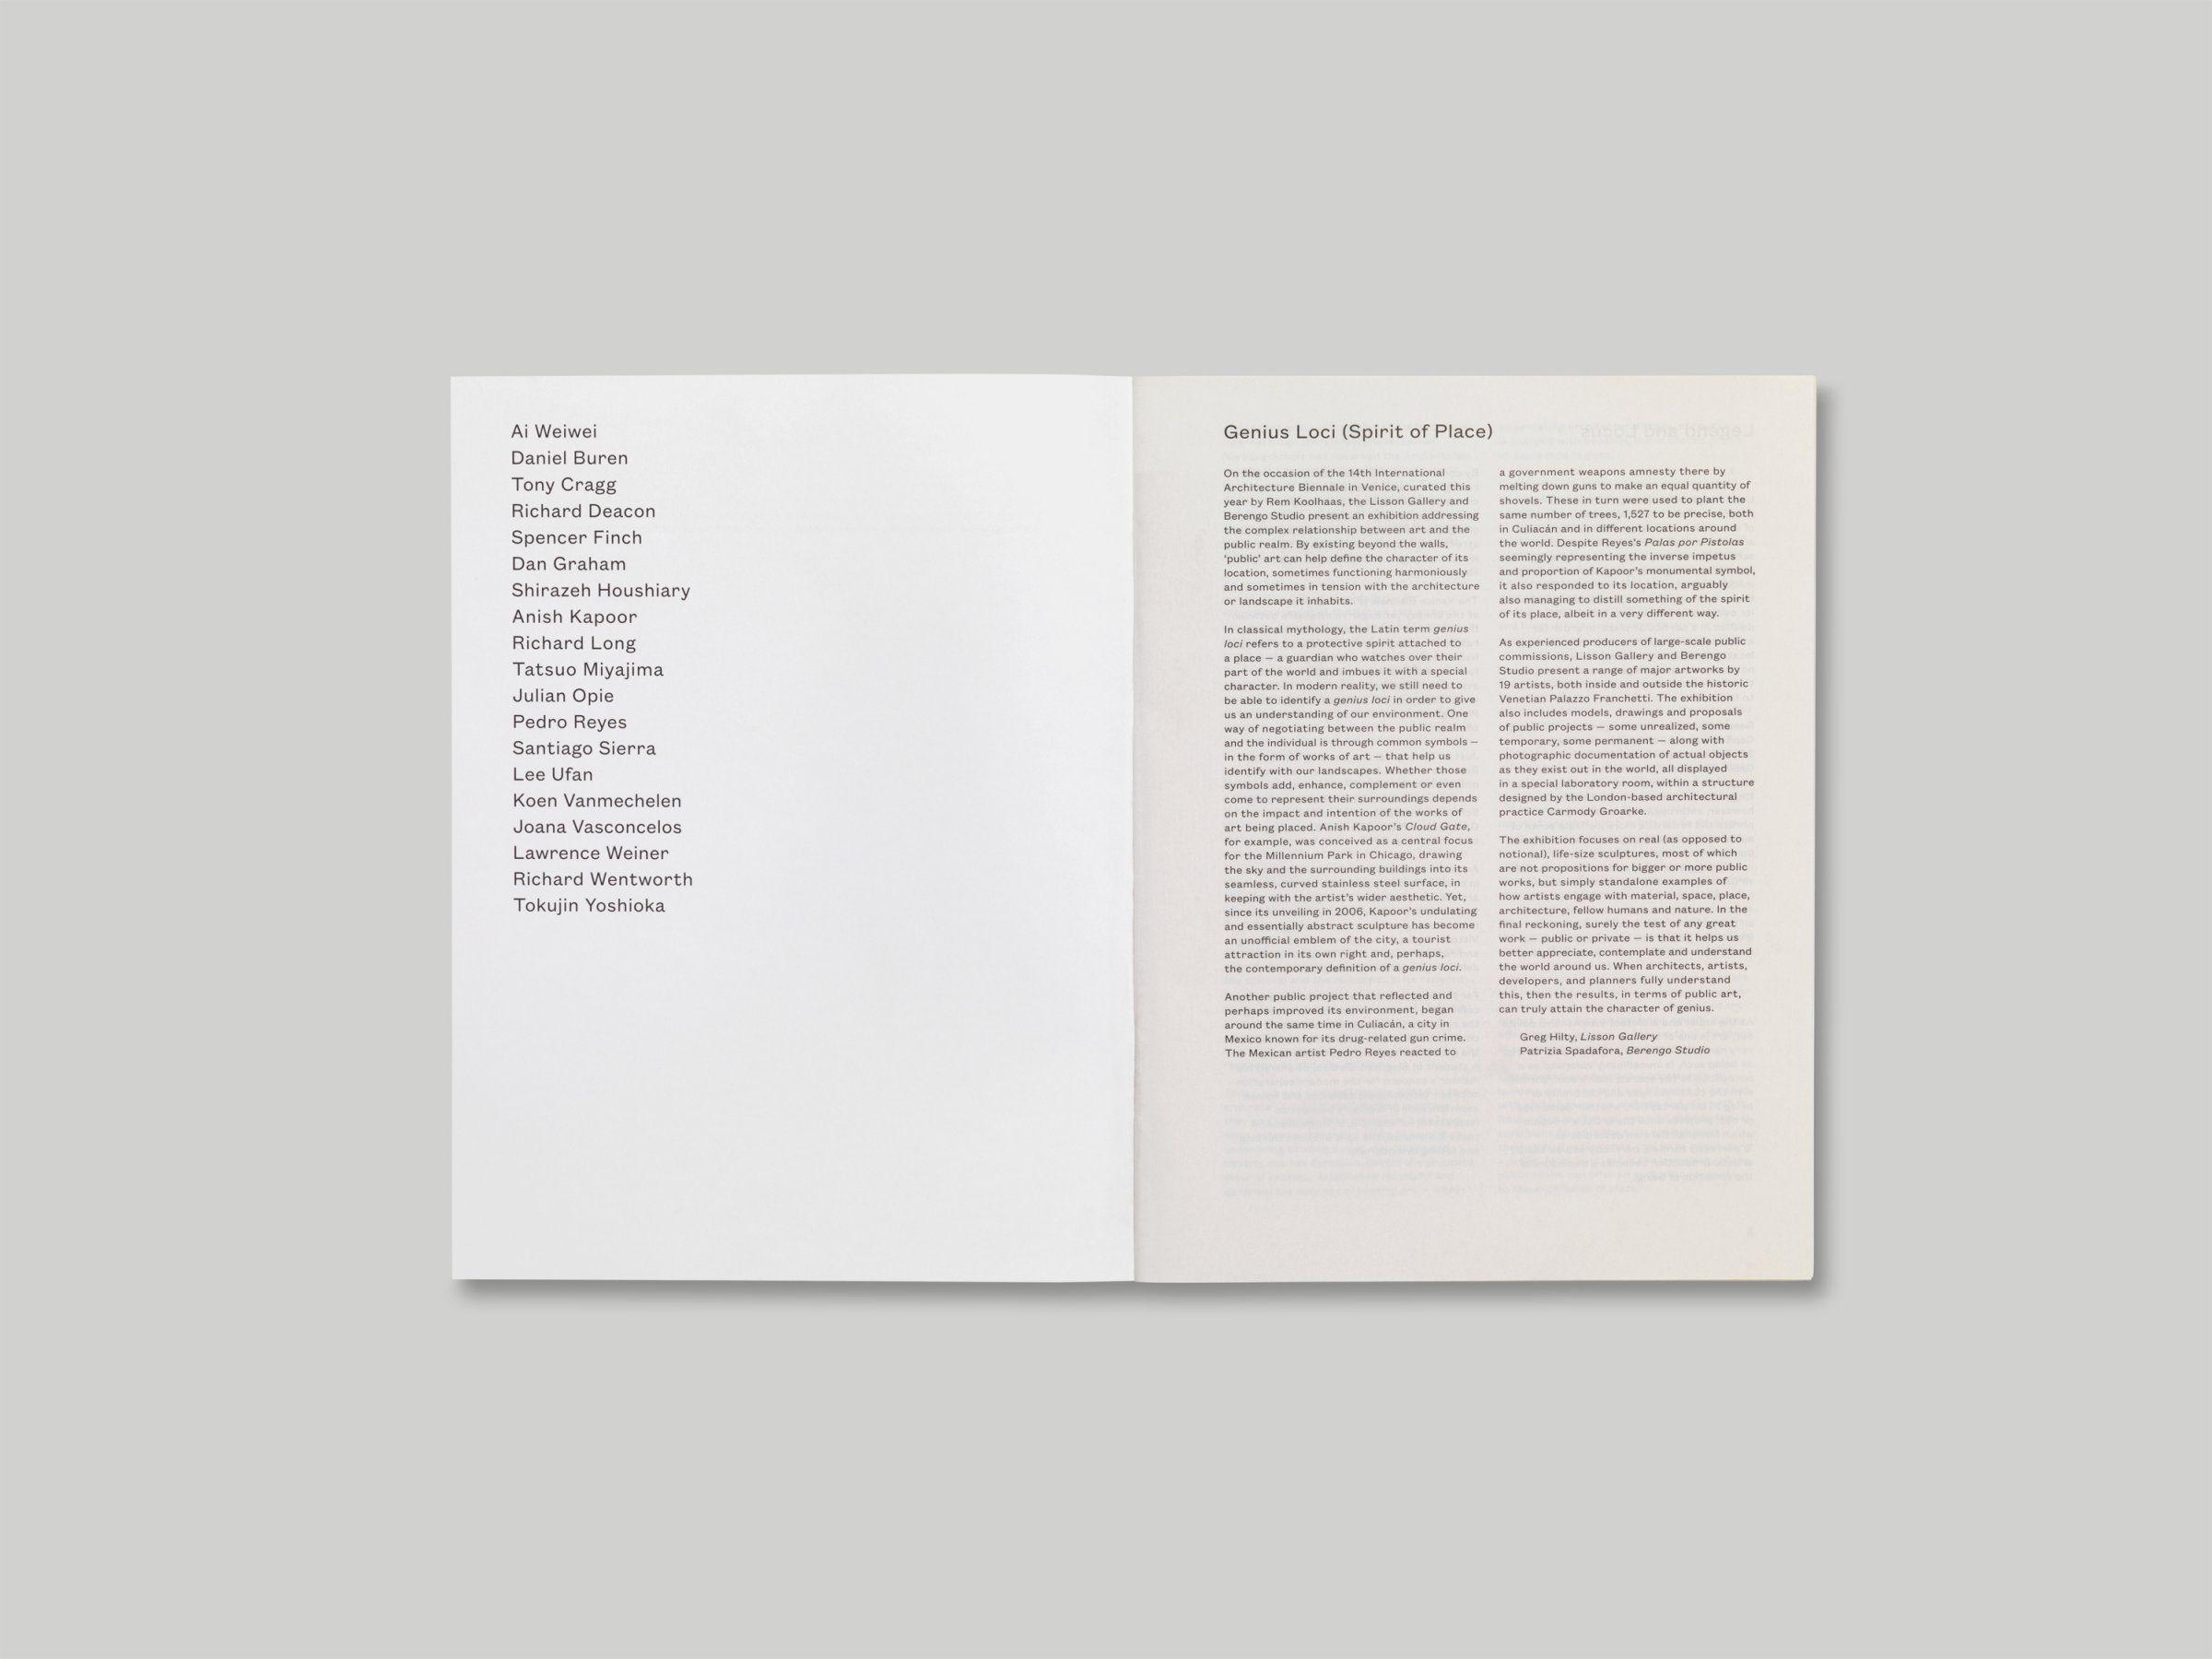 Genius Loci: Spirit of Place — A Practice for Everyday Life Kettle's Yard | A Practice for Everyday Life #graphicdesign #branding #identity #identitydesign